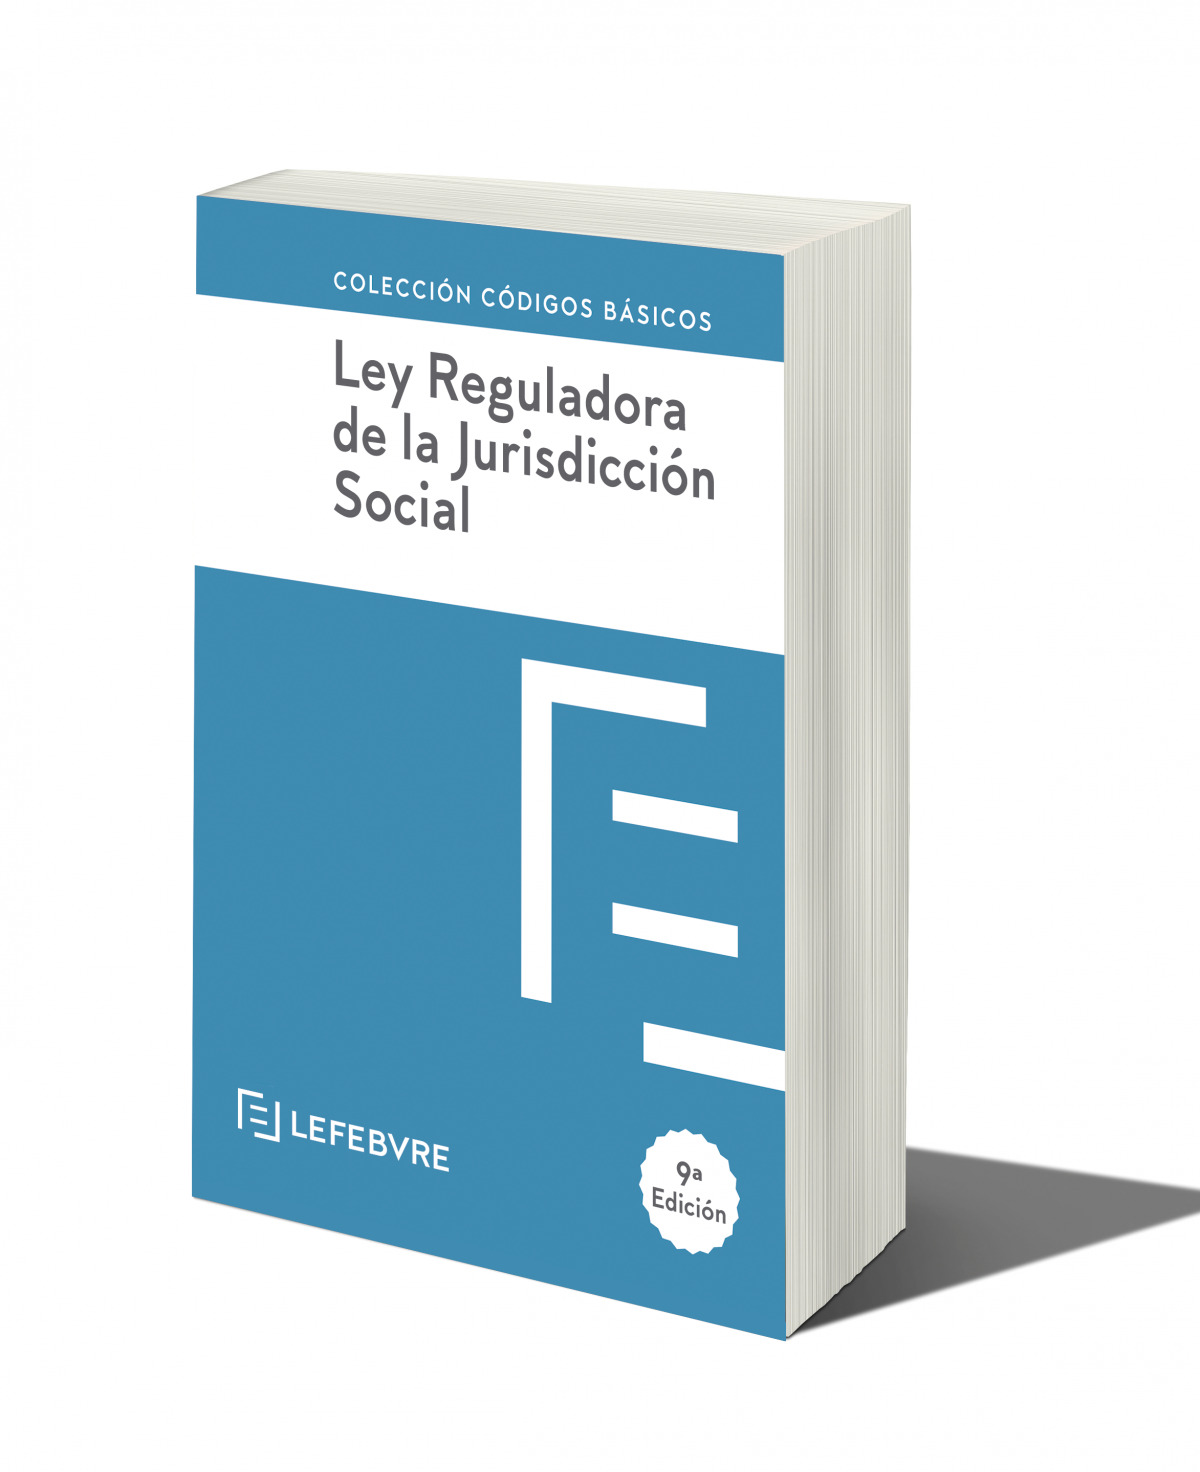 Ley Reguladora de la Jurisdiccion Social 9ª EDC.